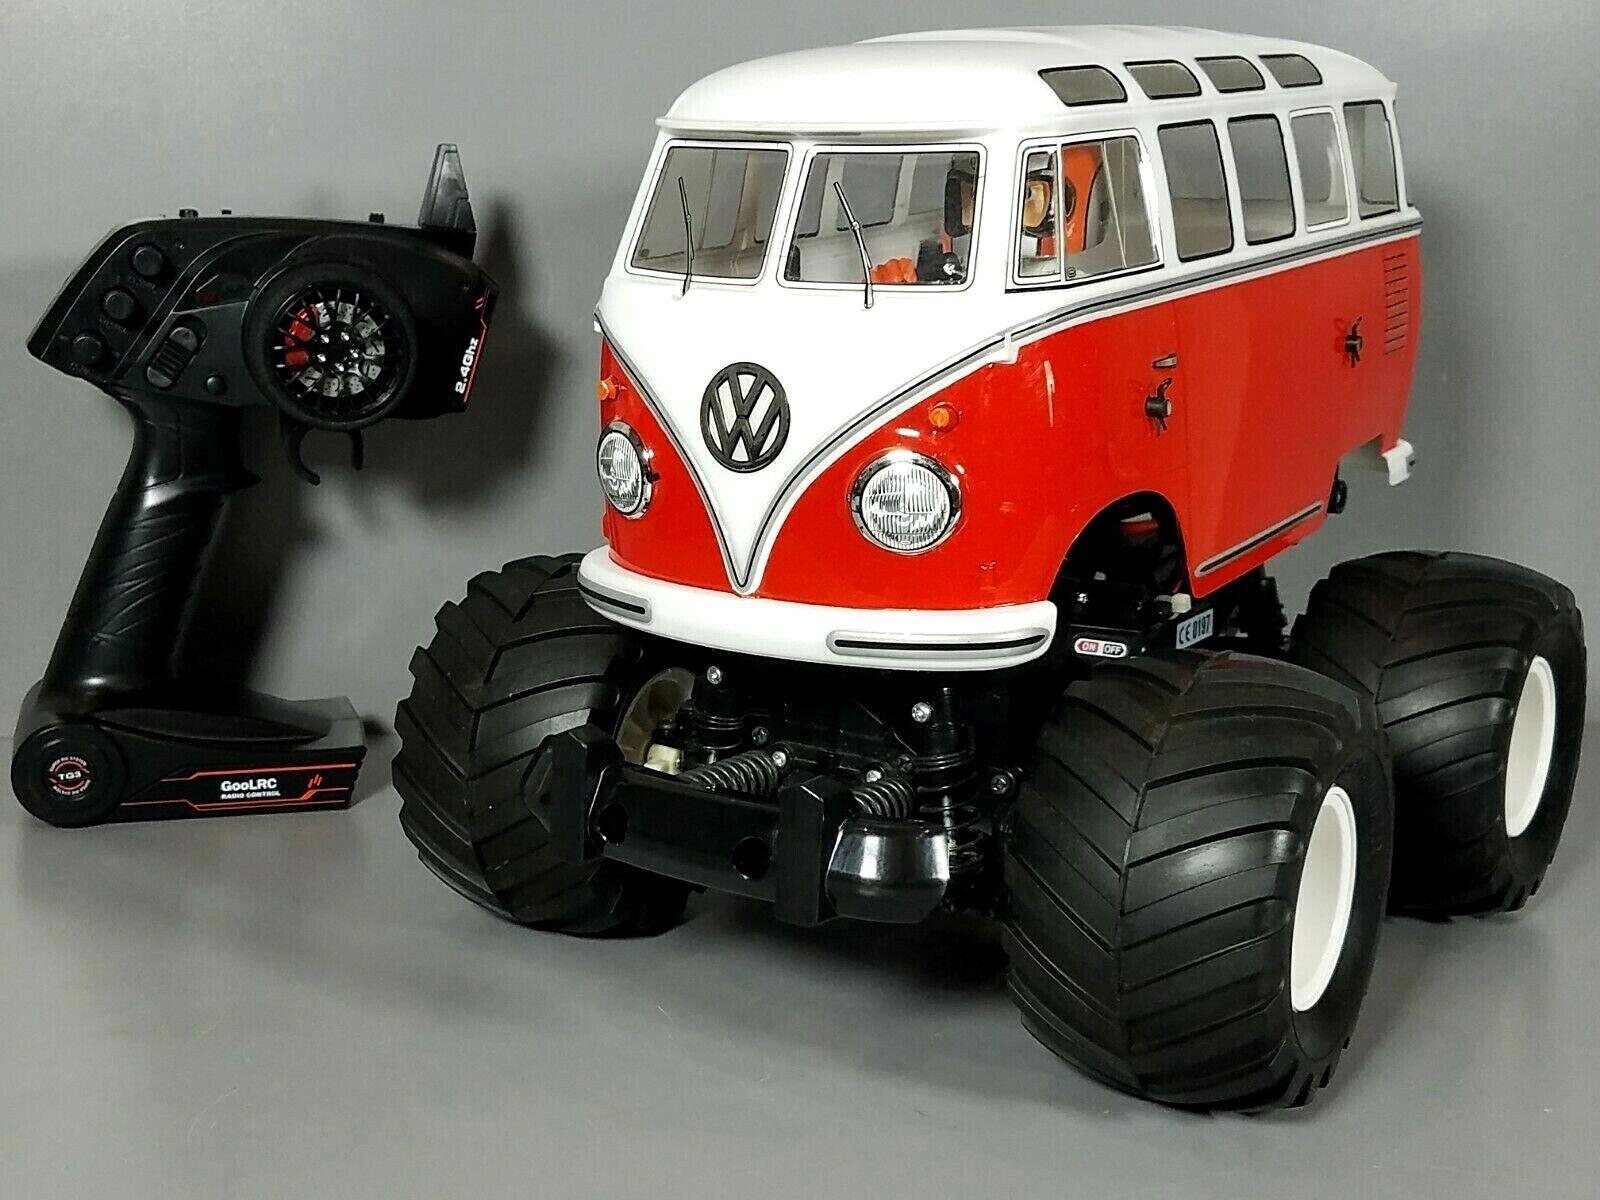 Used RC Tamiya  1 12 Volkswagen VW autoautobus Type 2 (T1) ruedaie 2.4GHz Remote Control  buona reputazione